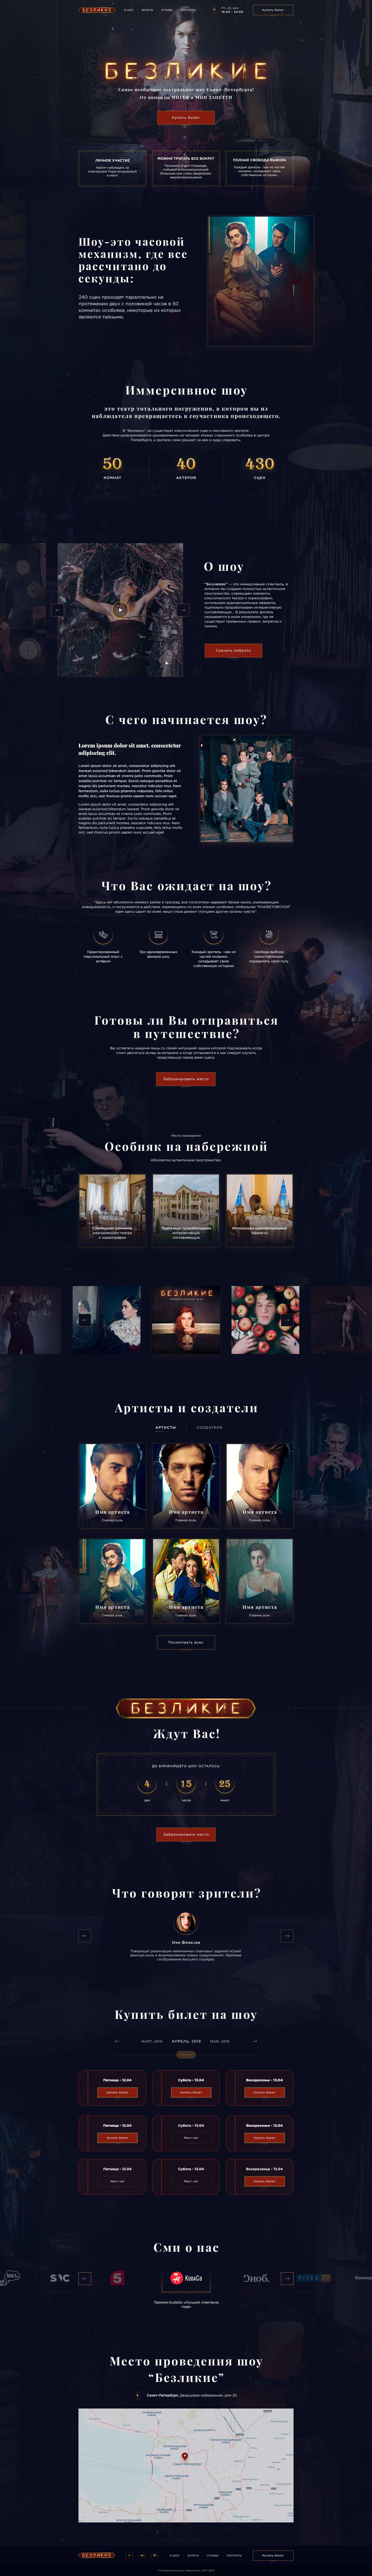 LP_Spektakl_01_Home_0.1